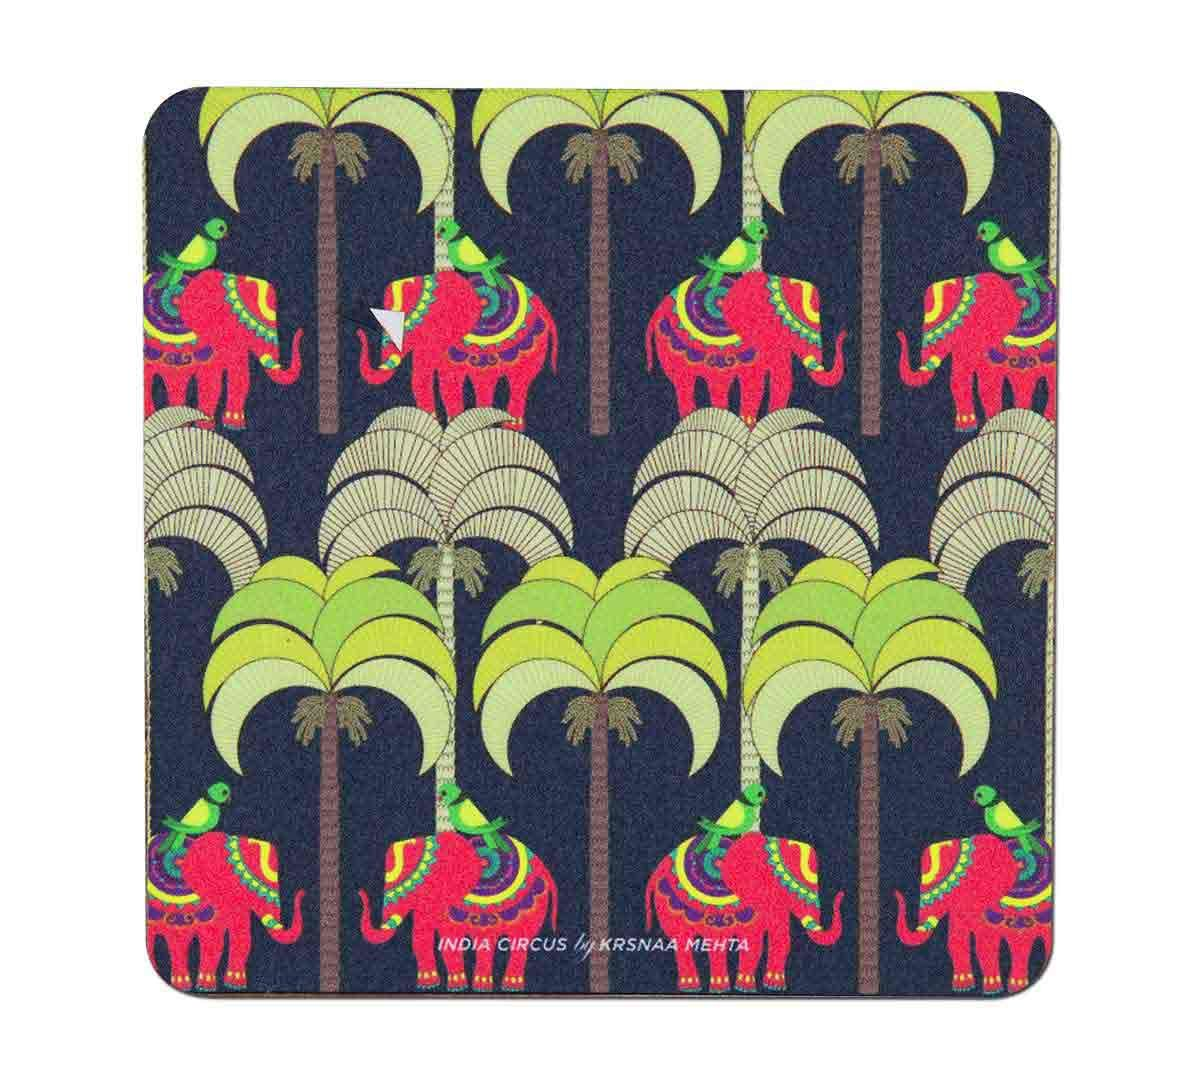 India Circus Palmeria Tusker Reiteration Table Coaster Set of 6